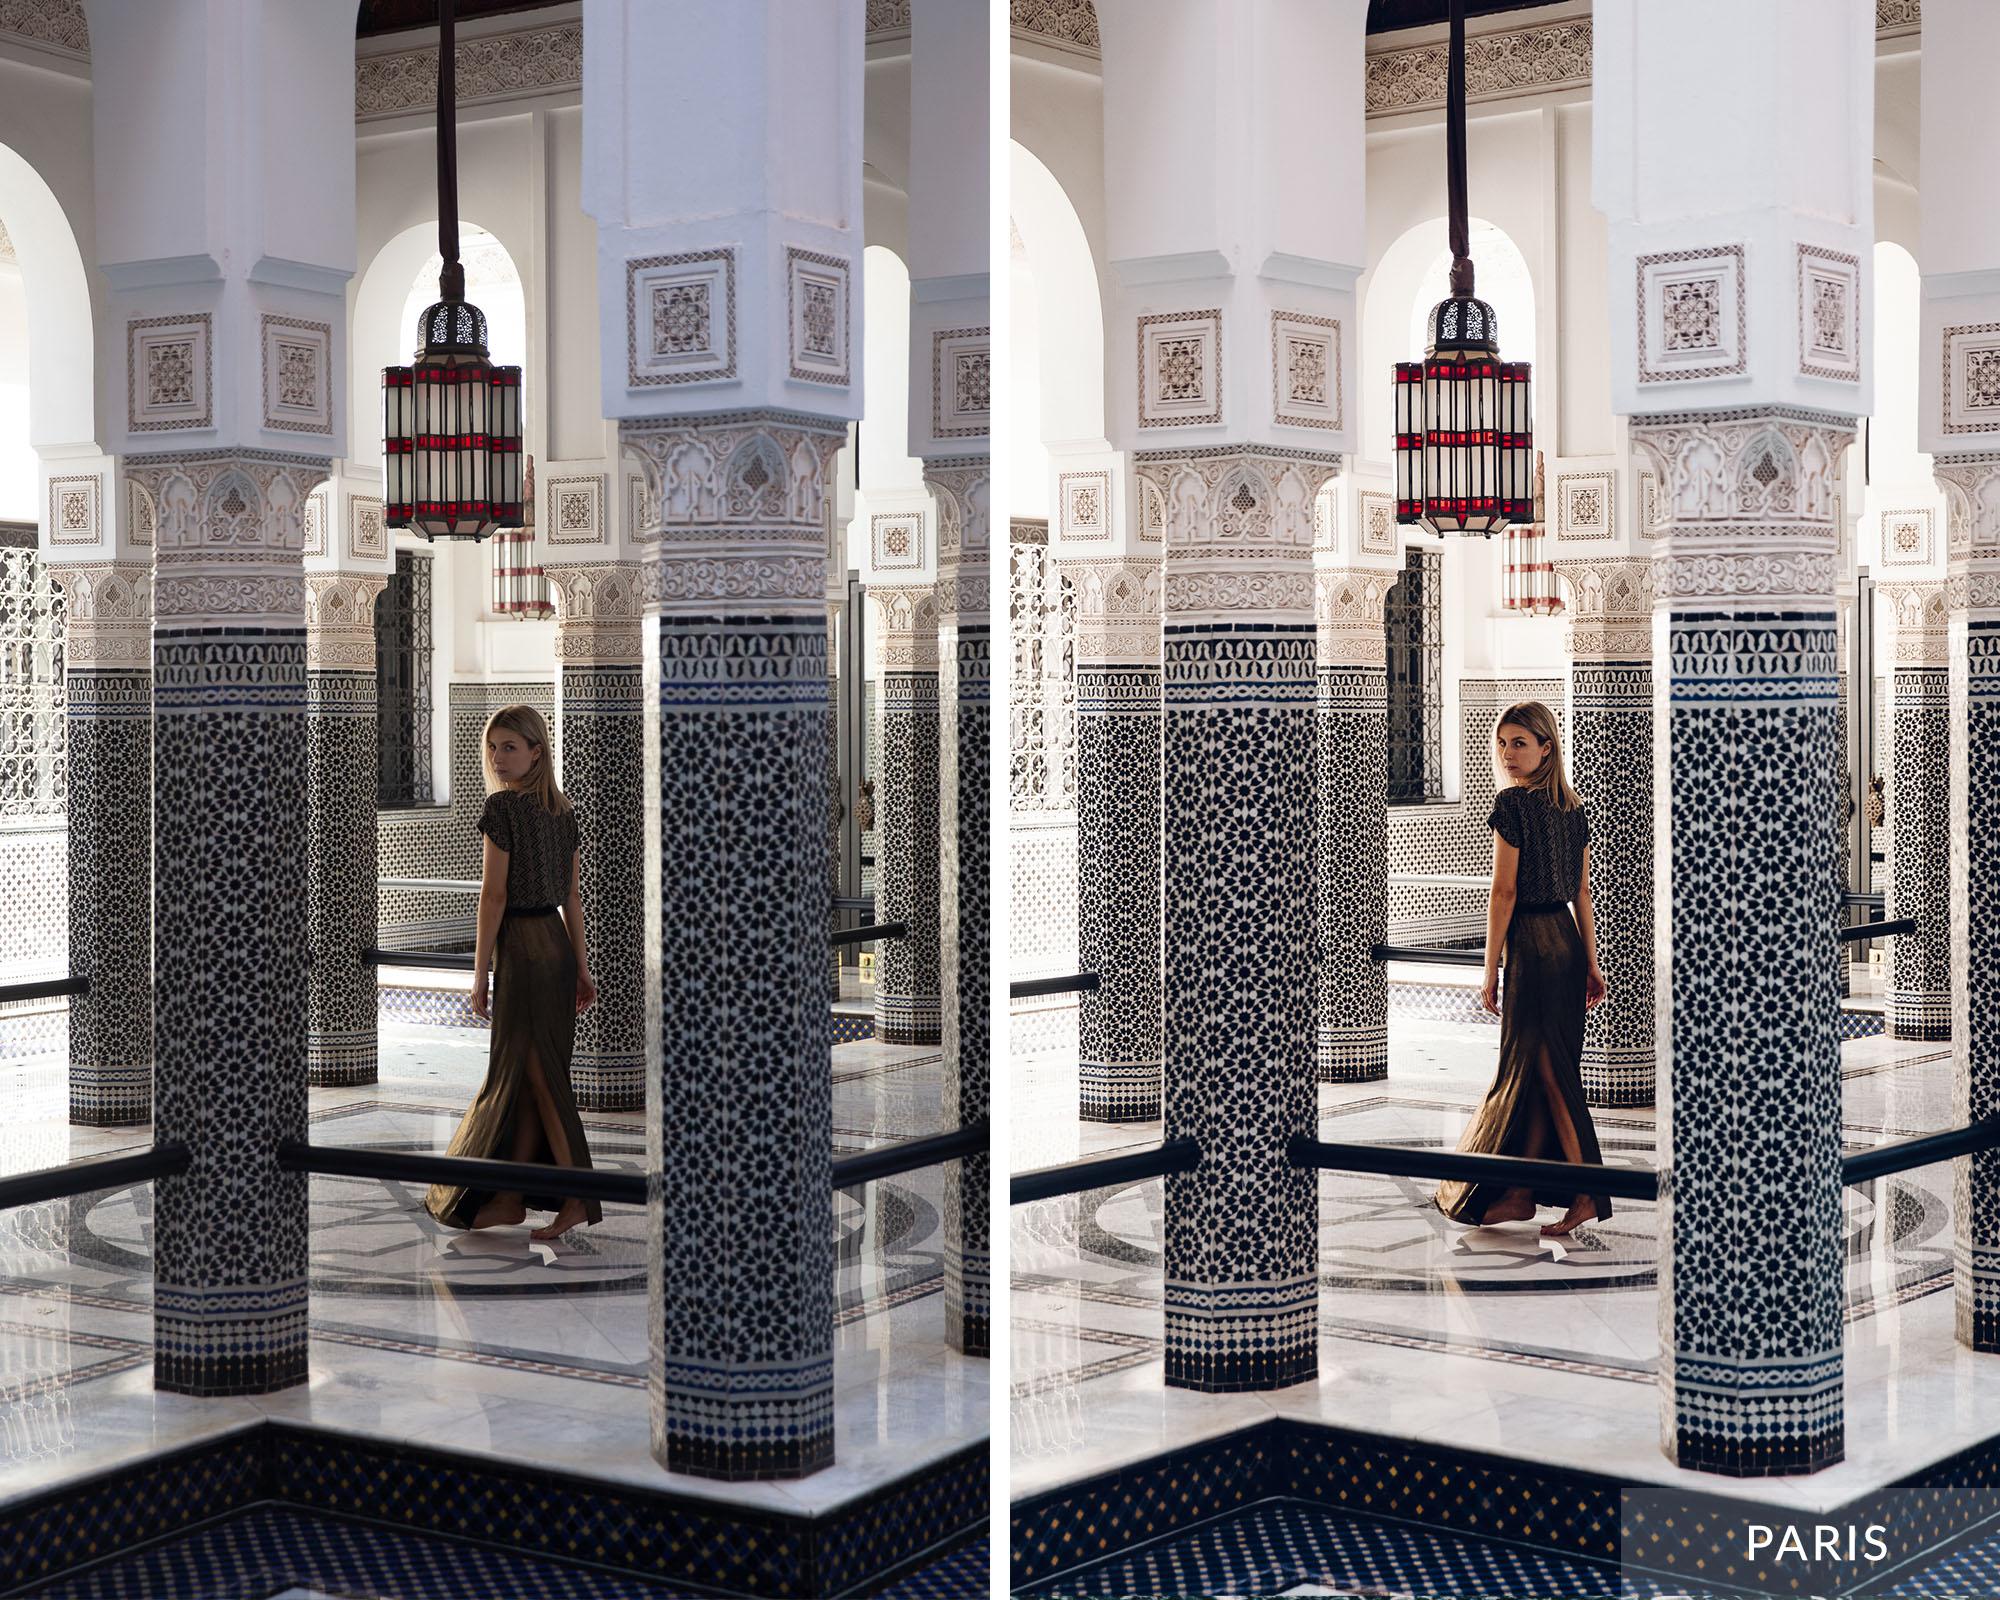 PARIS - Find Us Lost Europe Lightroom Mobile Preset Collection